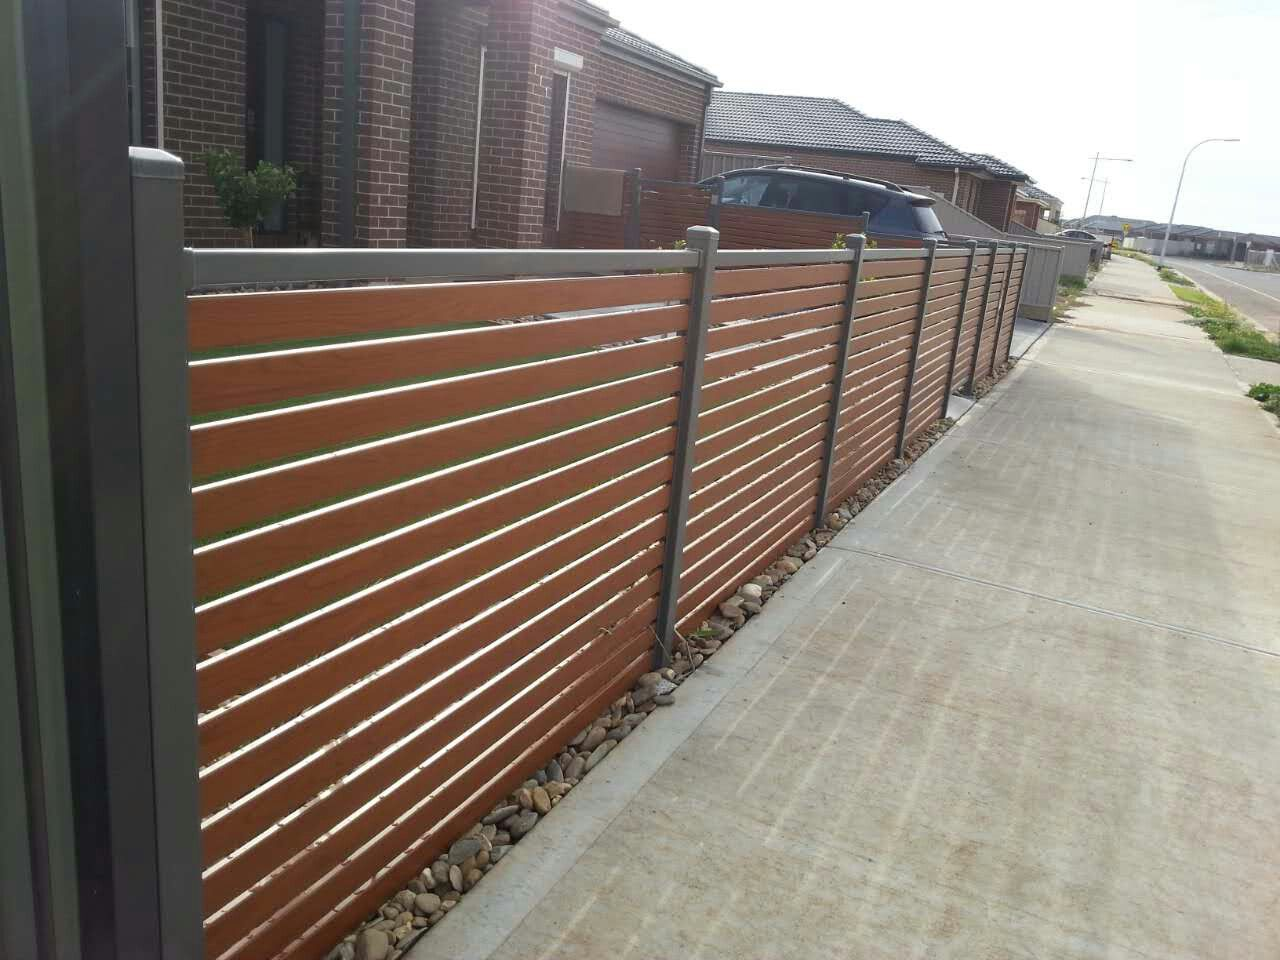 Aluminium Fencing Melbourne Metal Slat Fence Quotes Fence Design Horizontal Slat Fence Aluminum Fence